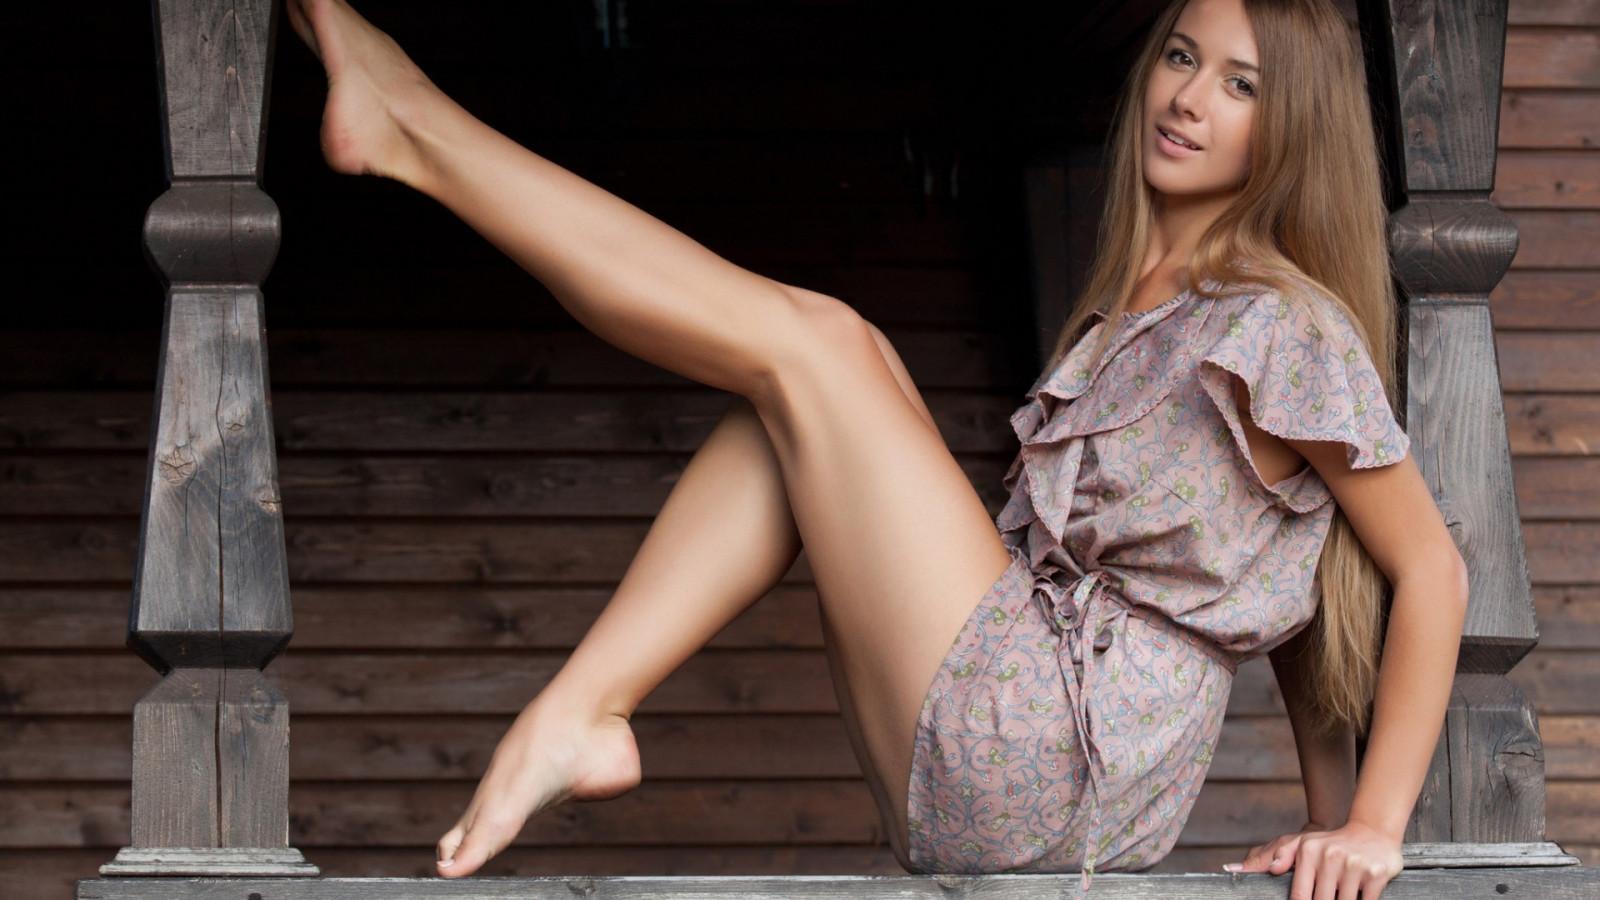 Wallpaper  Blonde, Long Hair, Barefoot, Sitting, Dress -3103